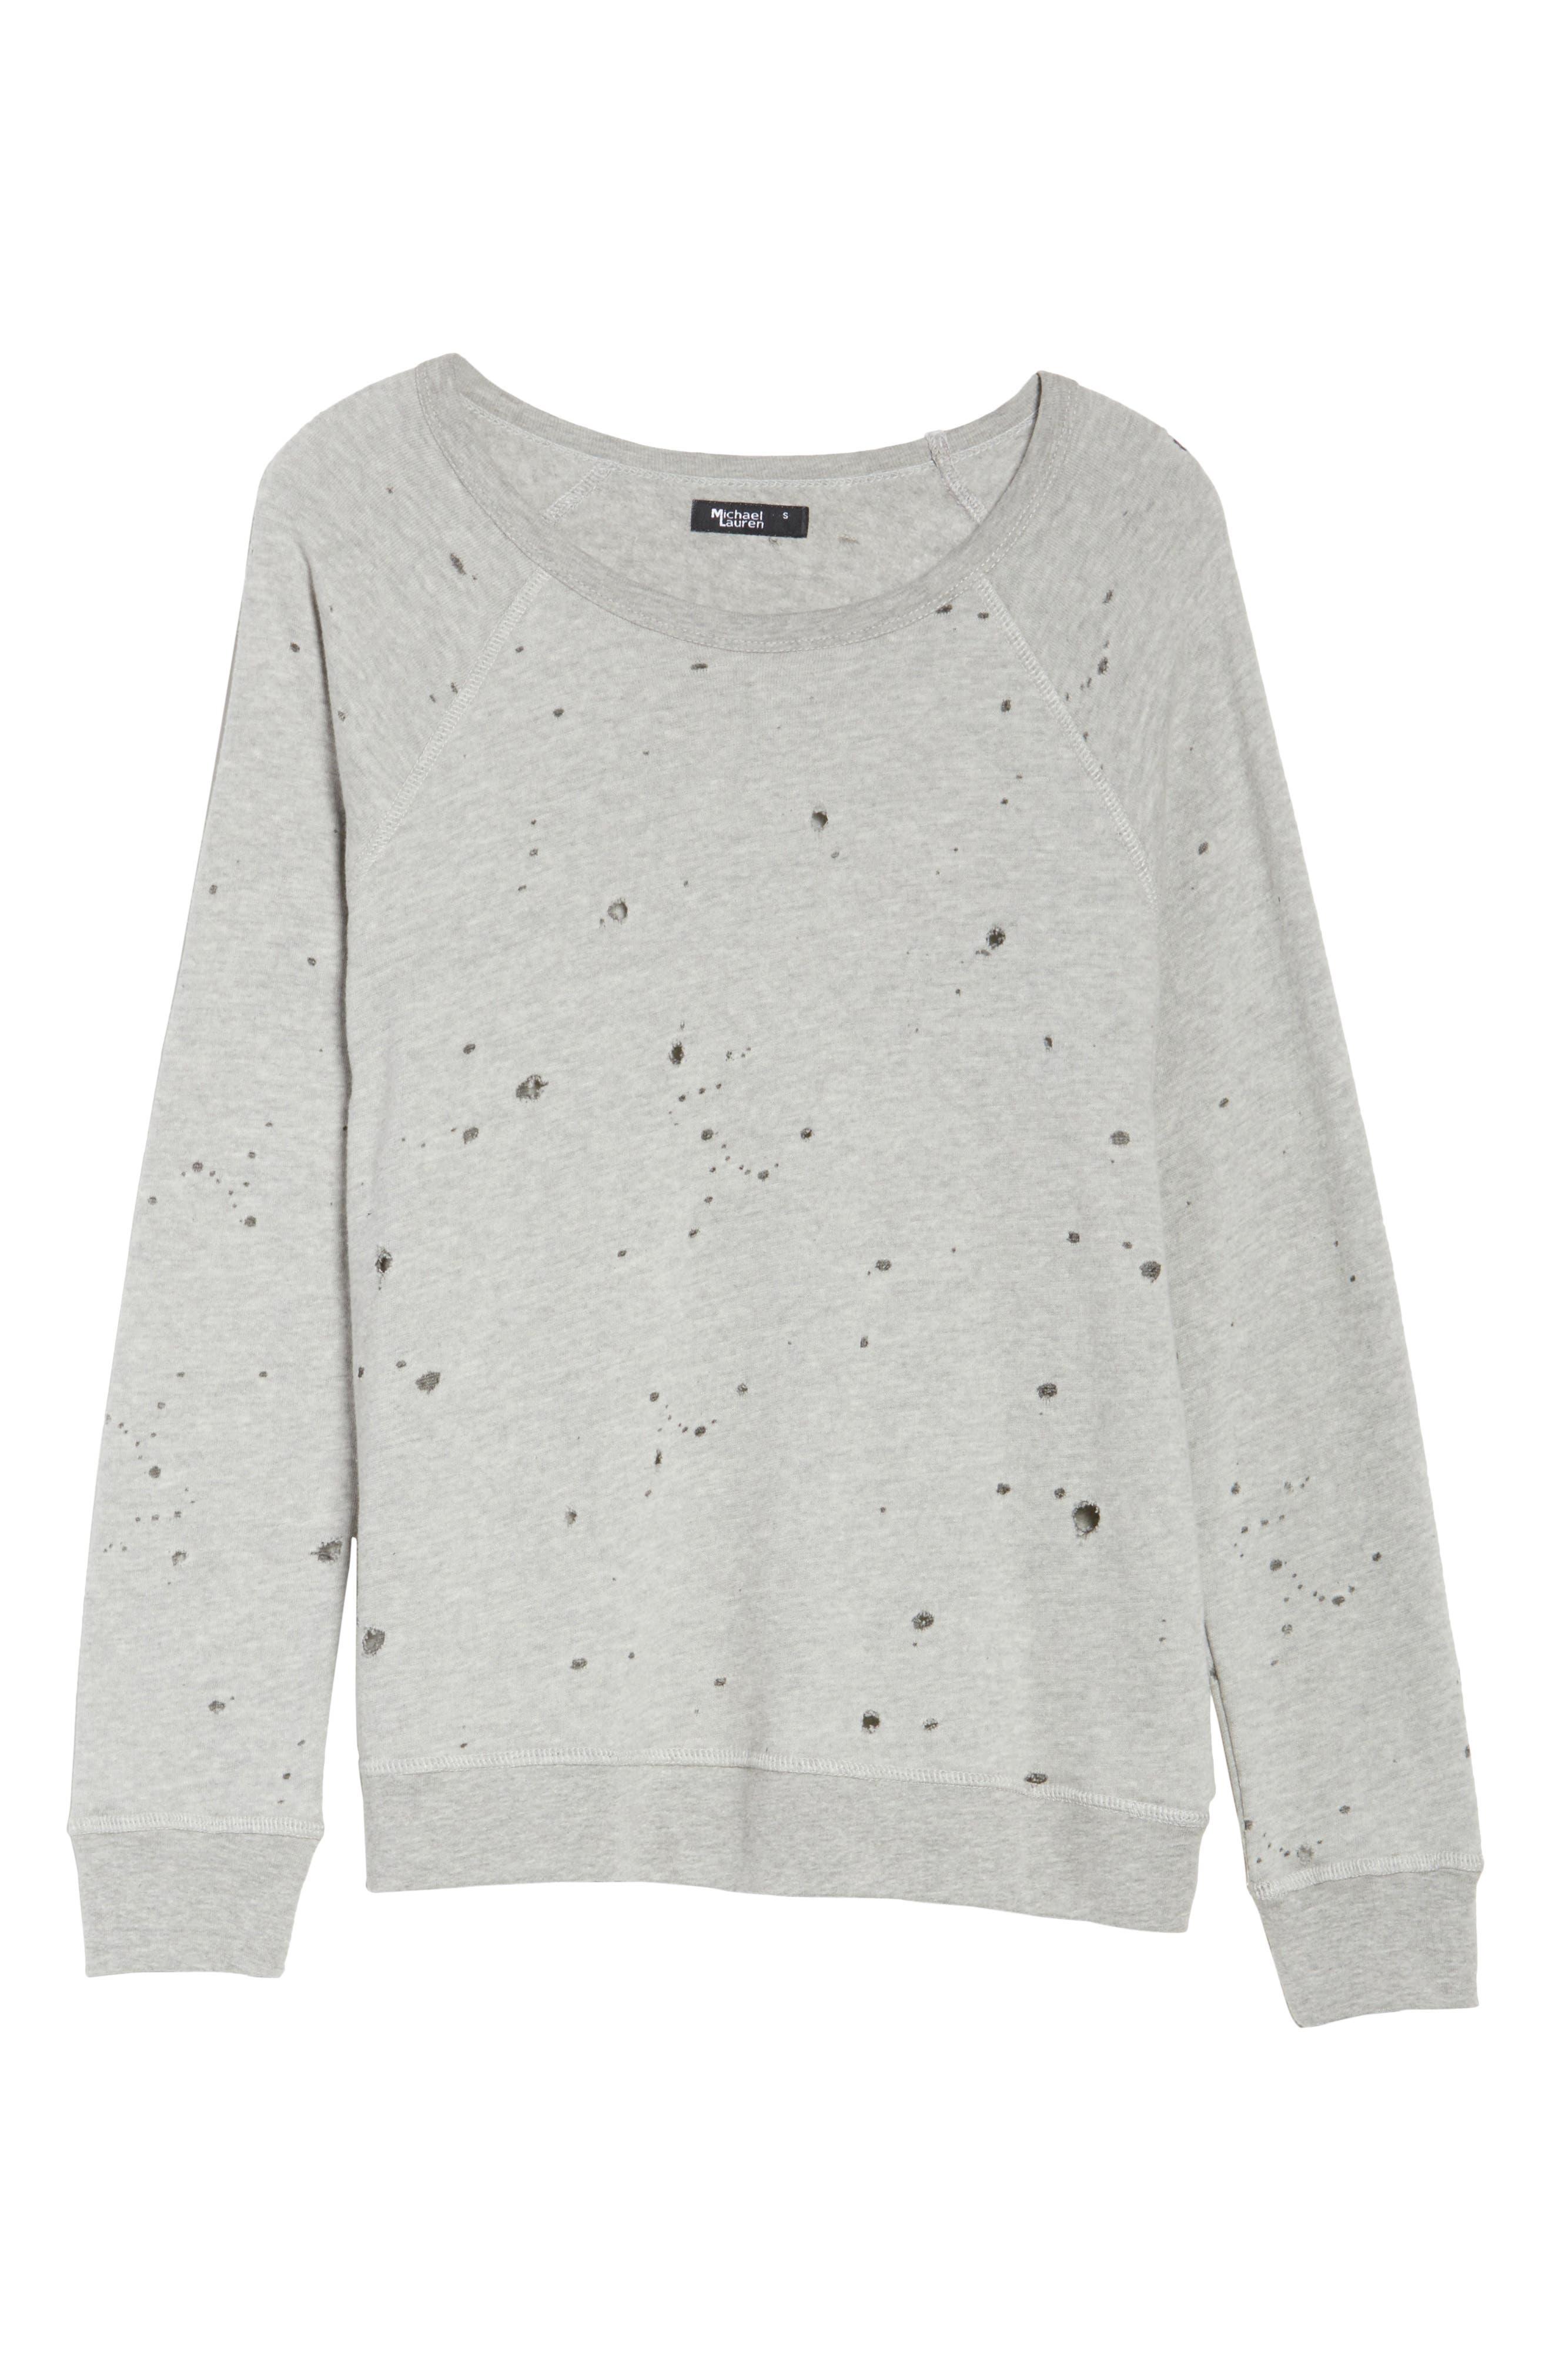 Destroyed Lounge Sweatshirt,                             Alternate thumbnail 6, color,                             Heather Grey